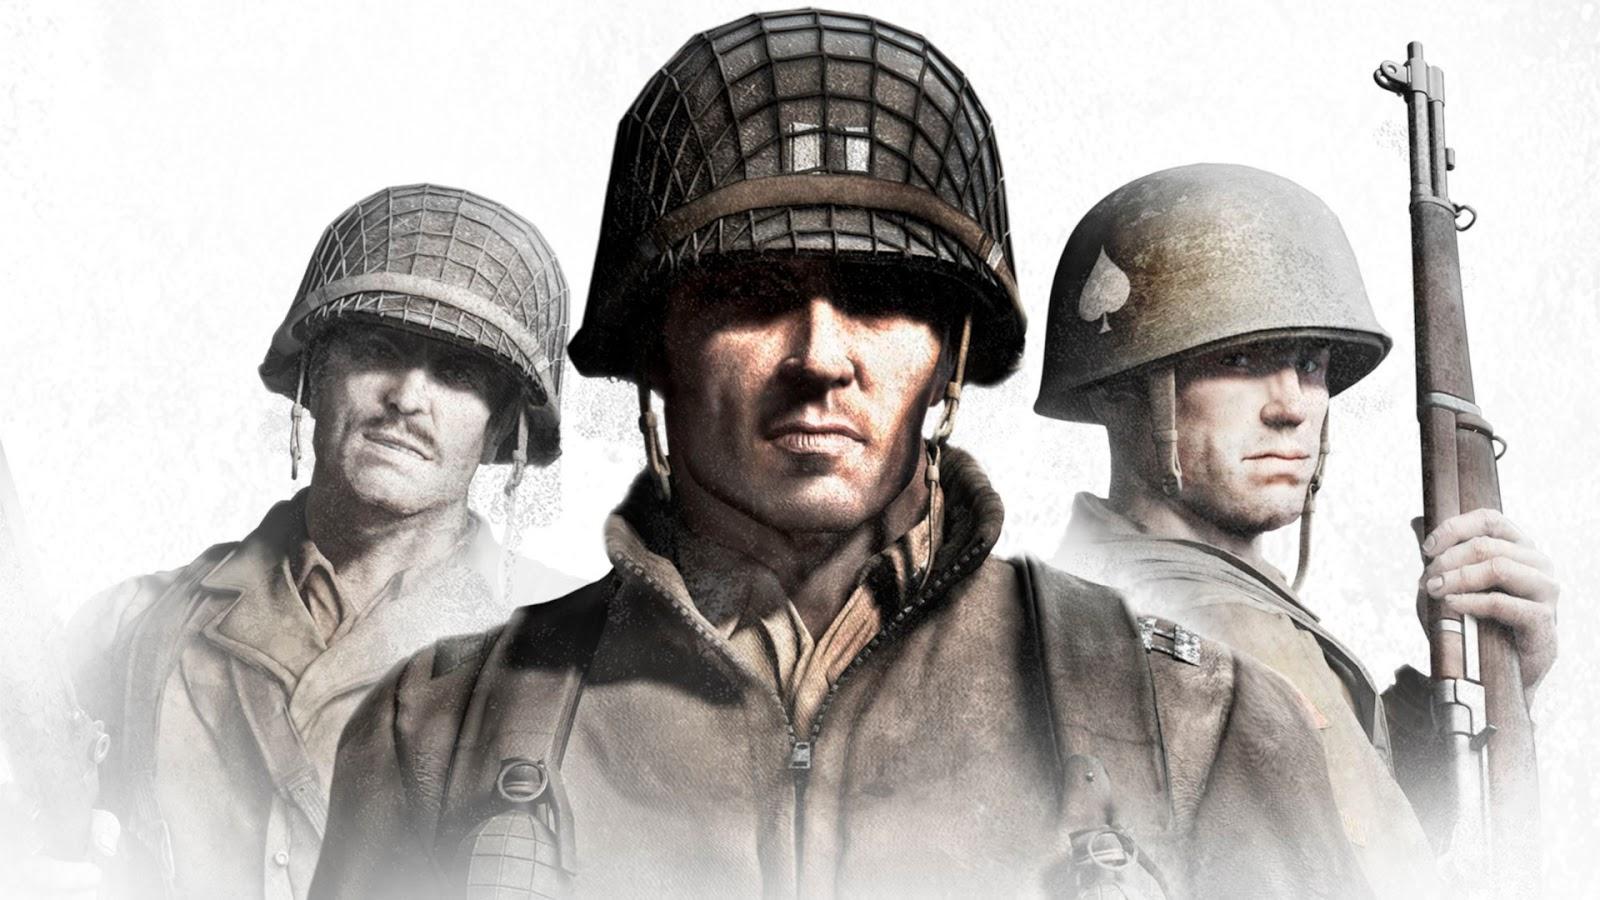 Kickstarter Highlights - Company of Heroes